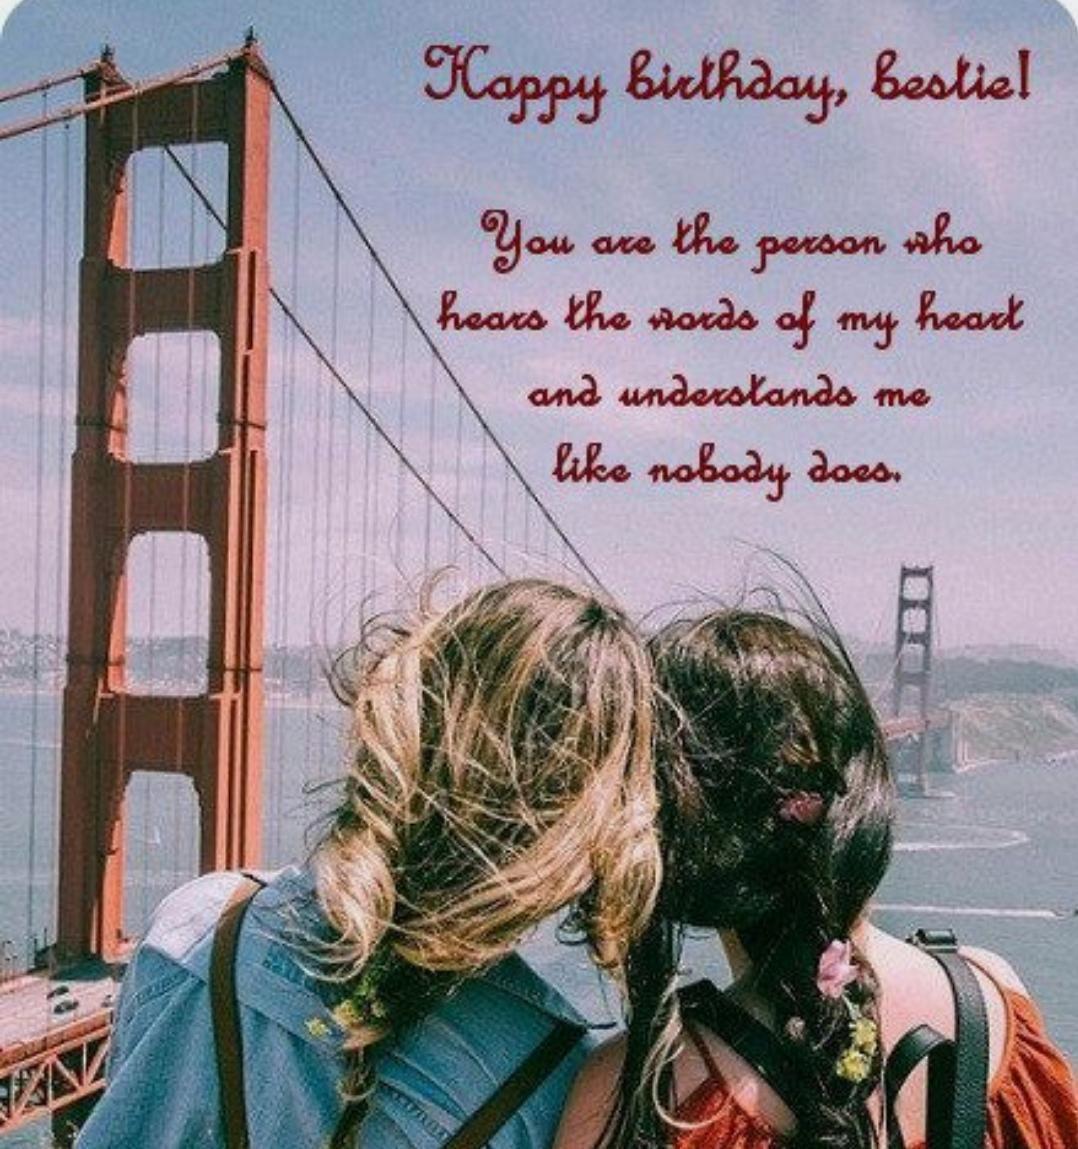 Pin By Malak On Birthdays Happy Birthday Bestie Quotes Happy Birthday Wishes Quotes Happy Birthday Quotes